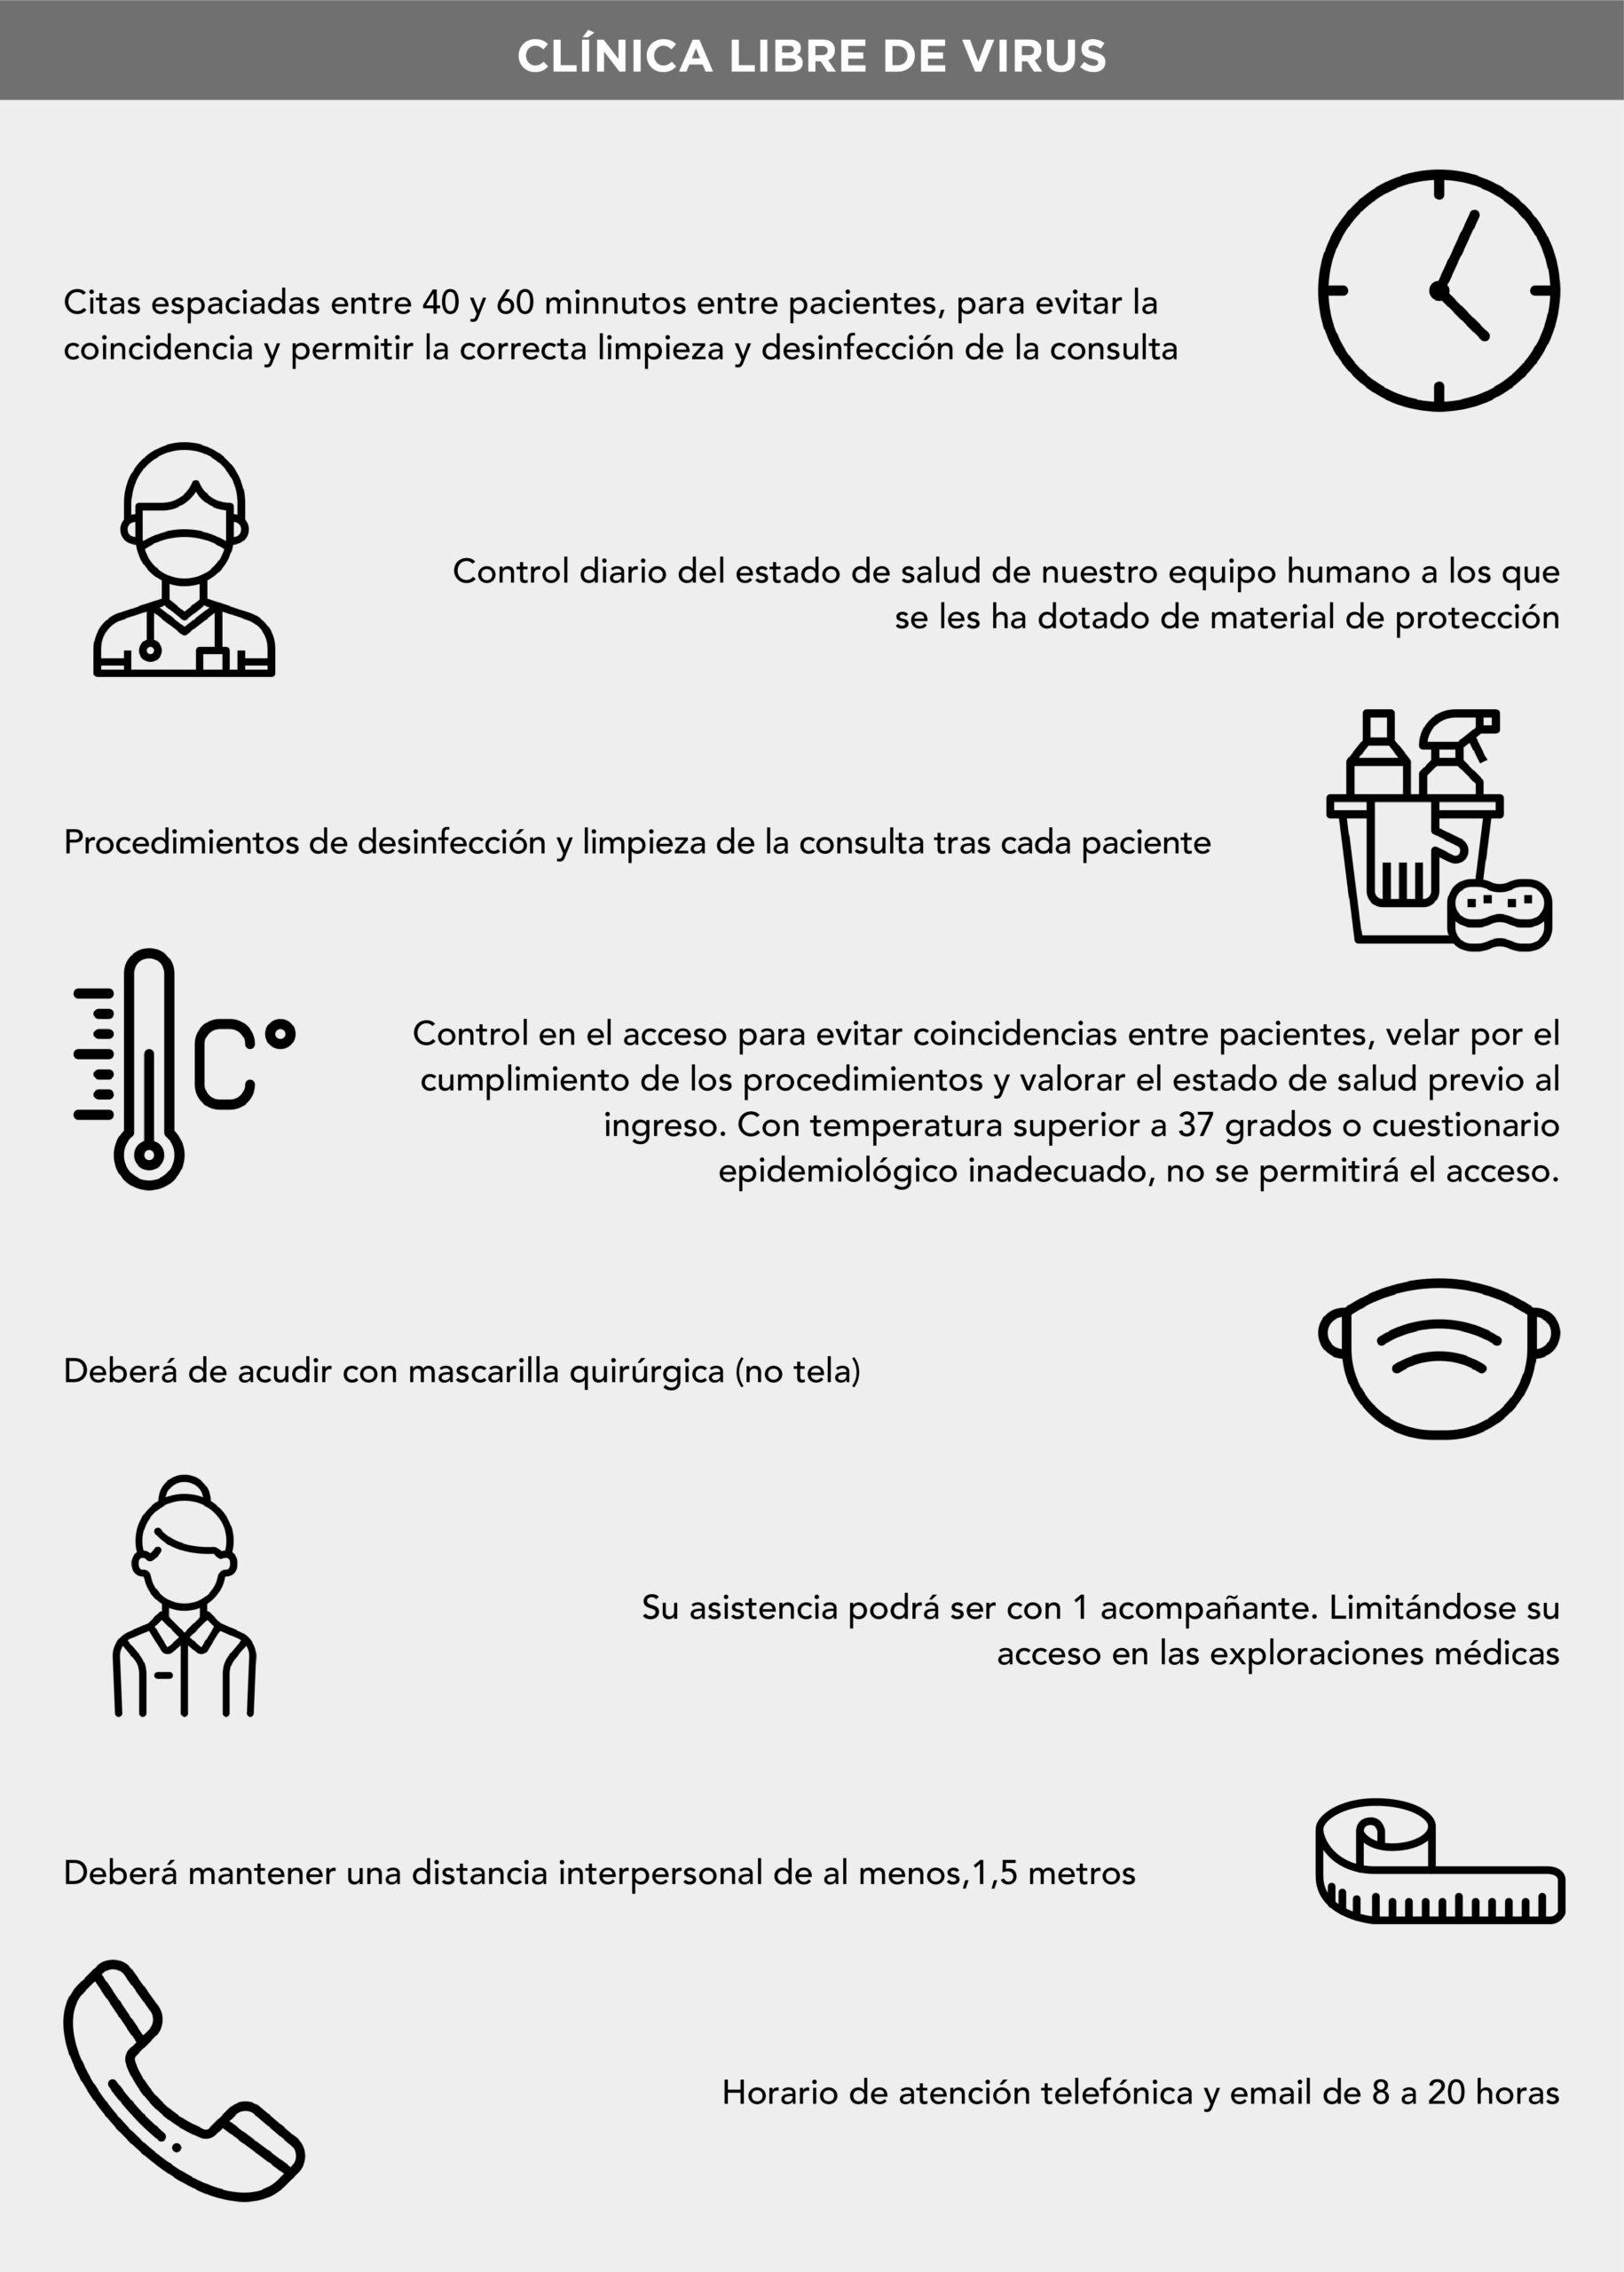 Clínica libre de virus Instituto Bernabeu